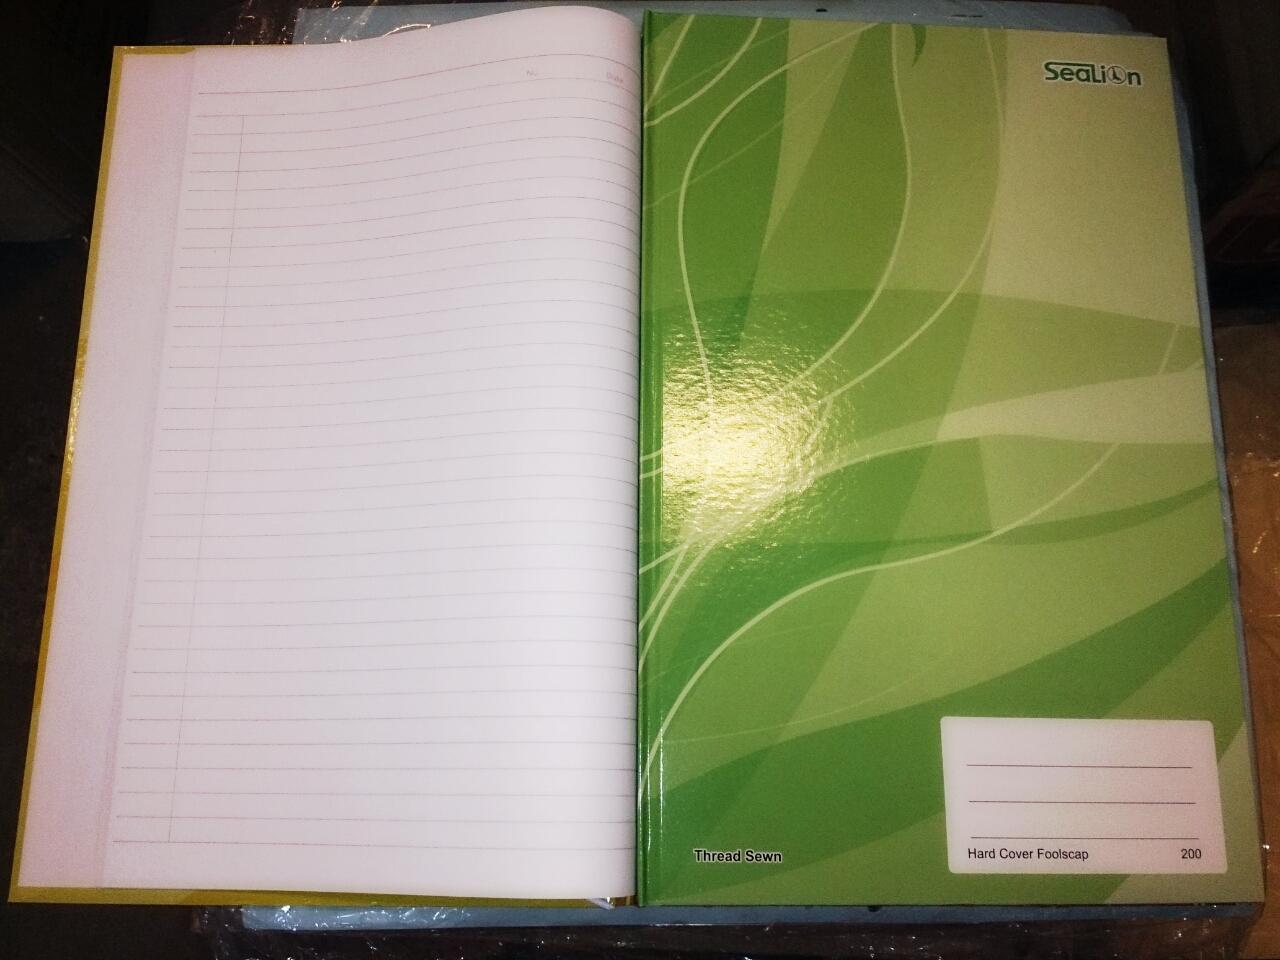 Hard Cover Foolscap Book Flexcos Office Supplies Sdn Bhd